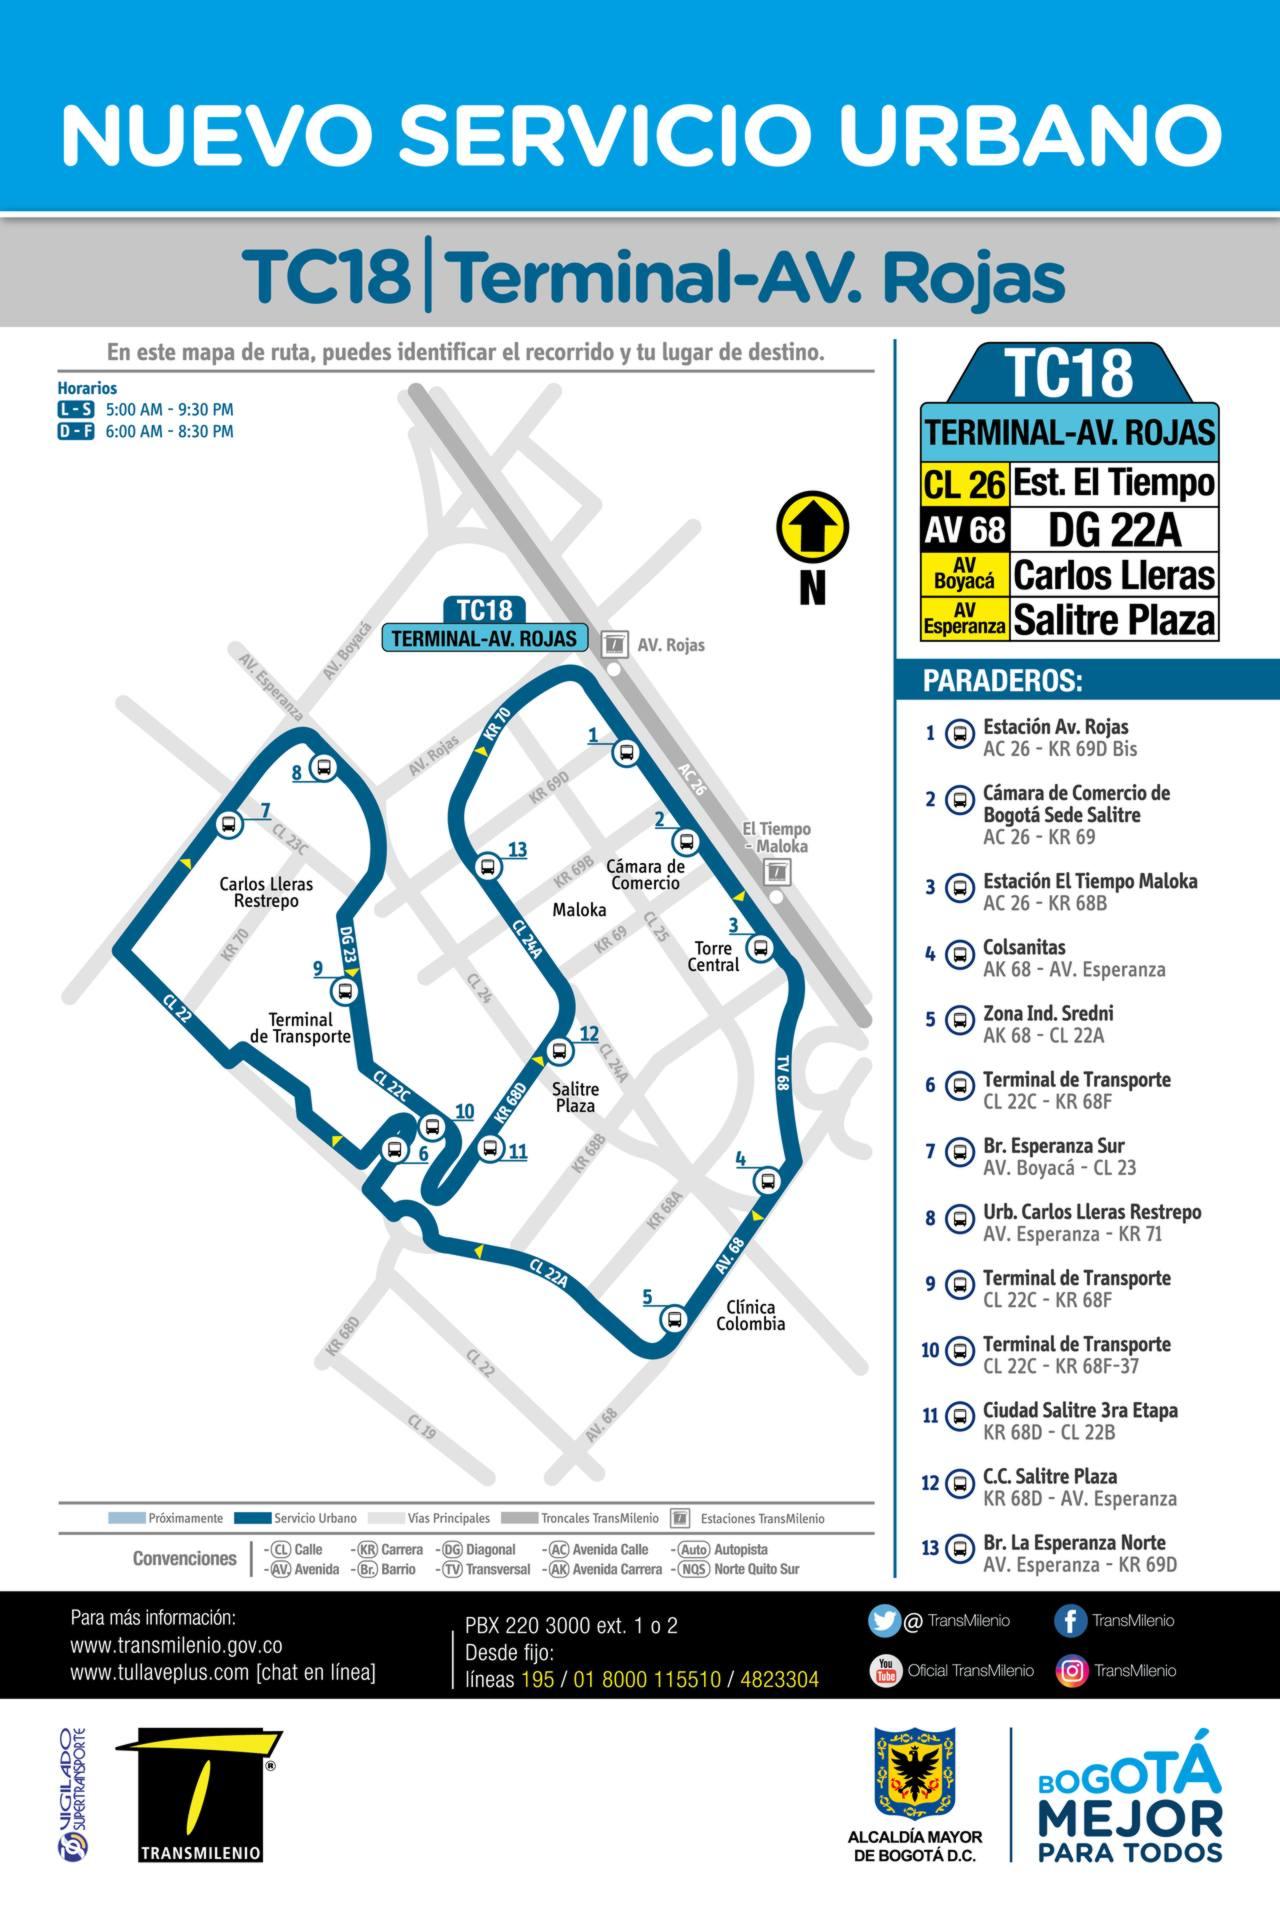 tc18_ruta_sitp_mapa_urbana_bogota_2016_optimized_2016_optimized